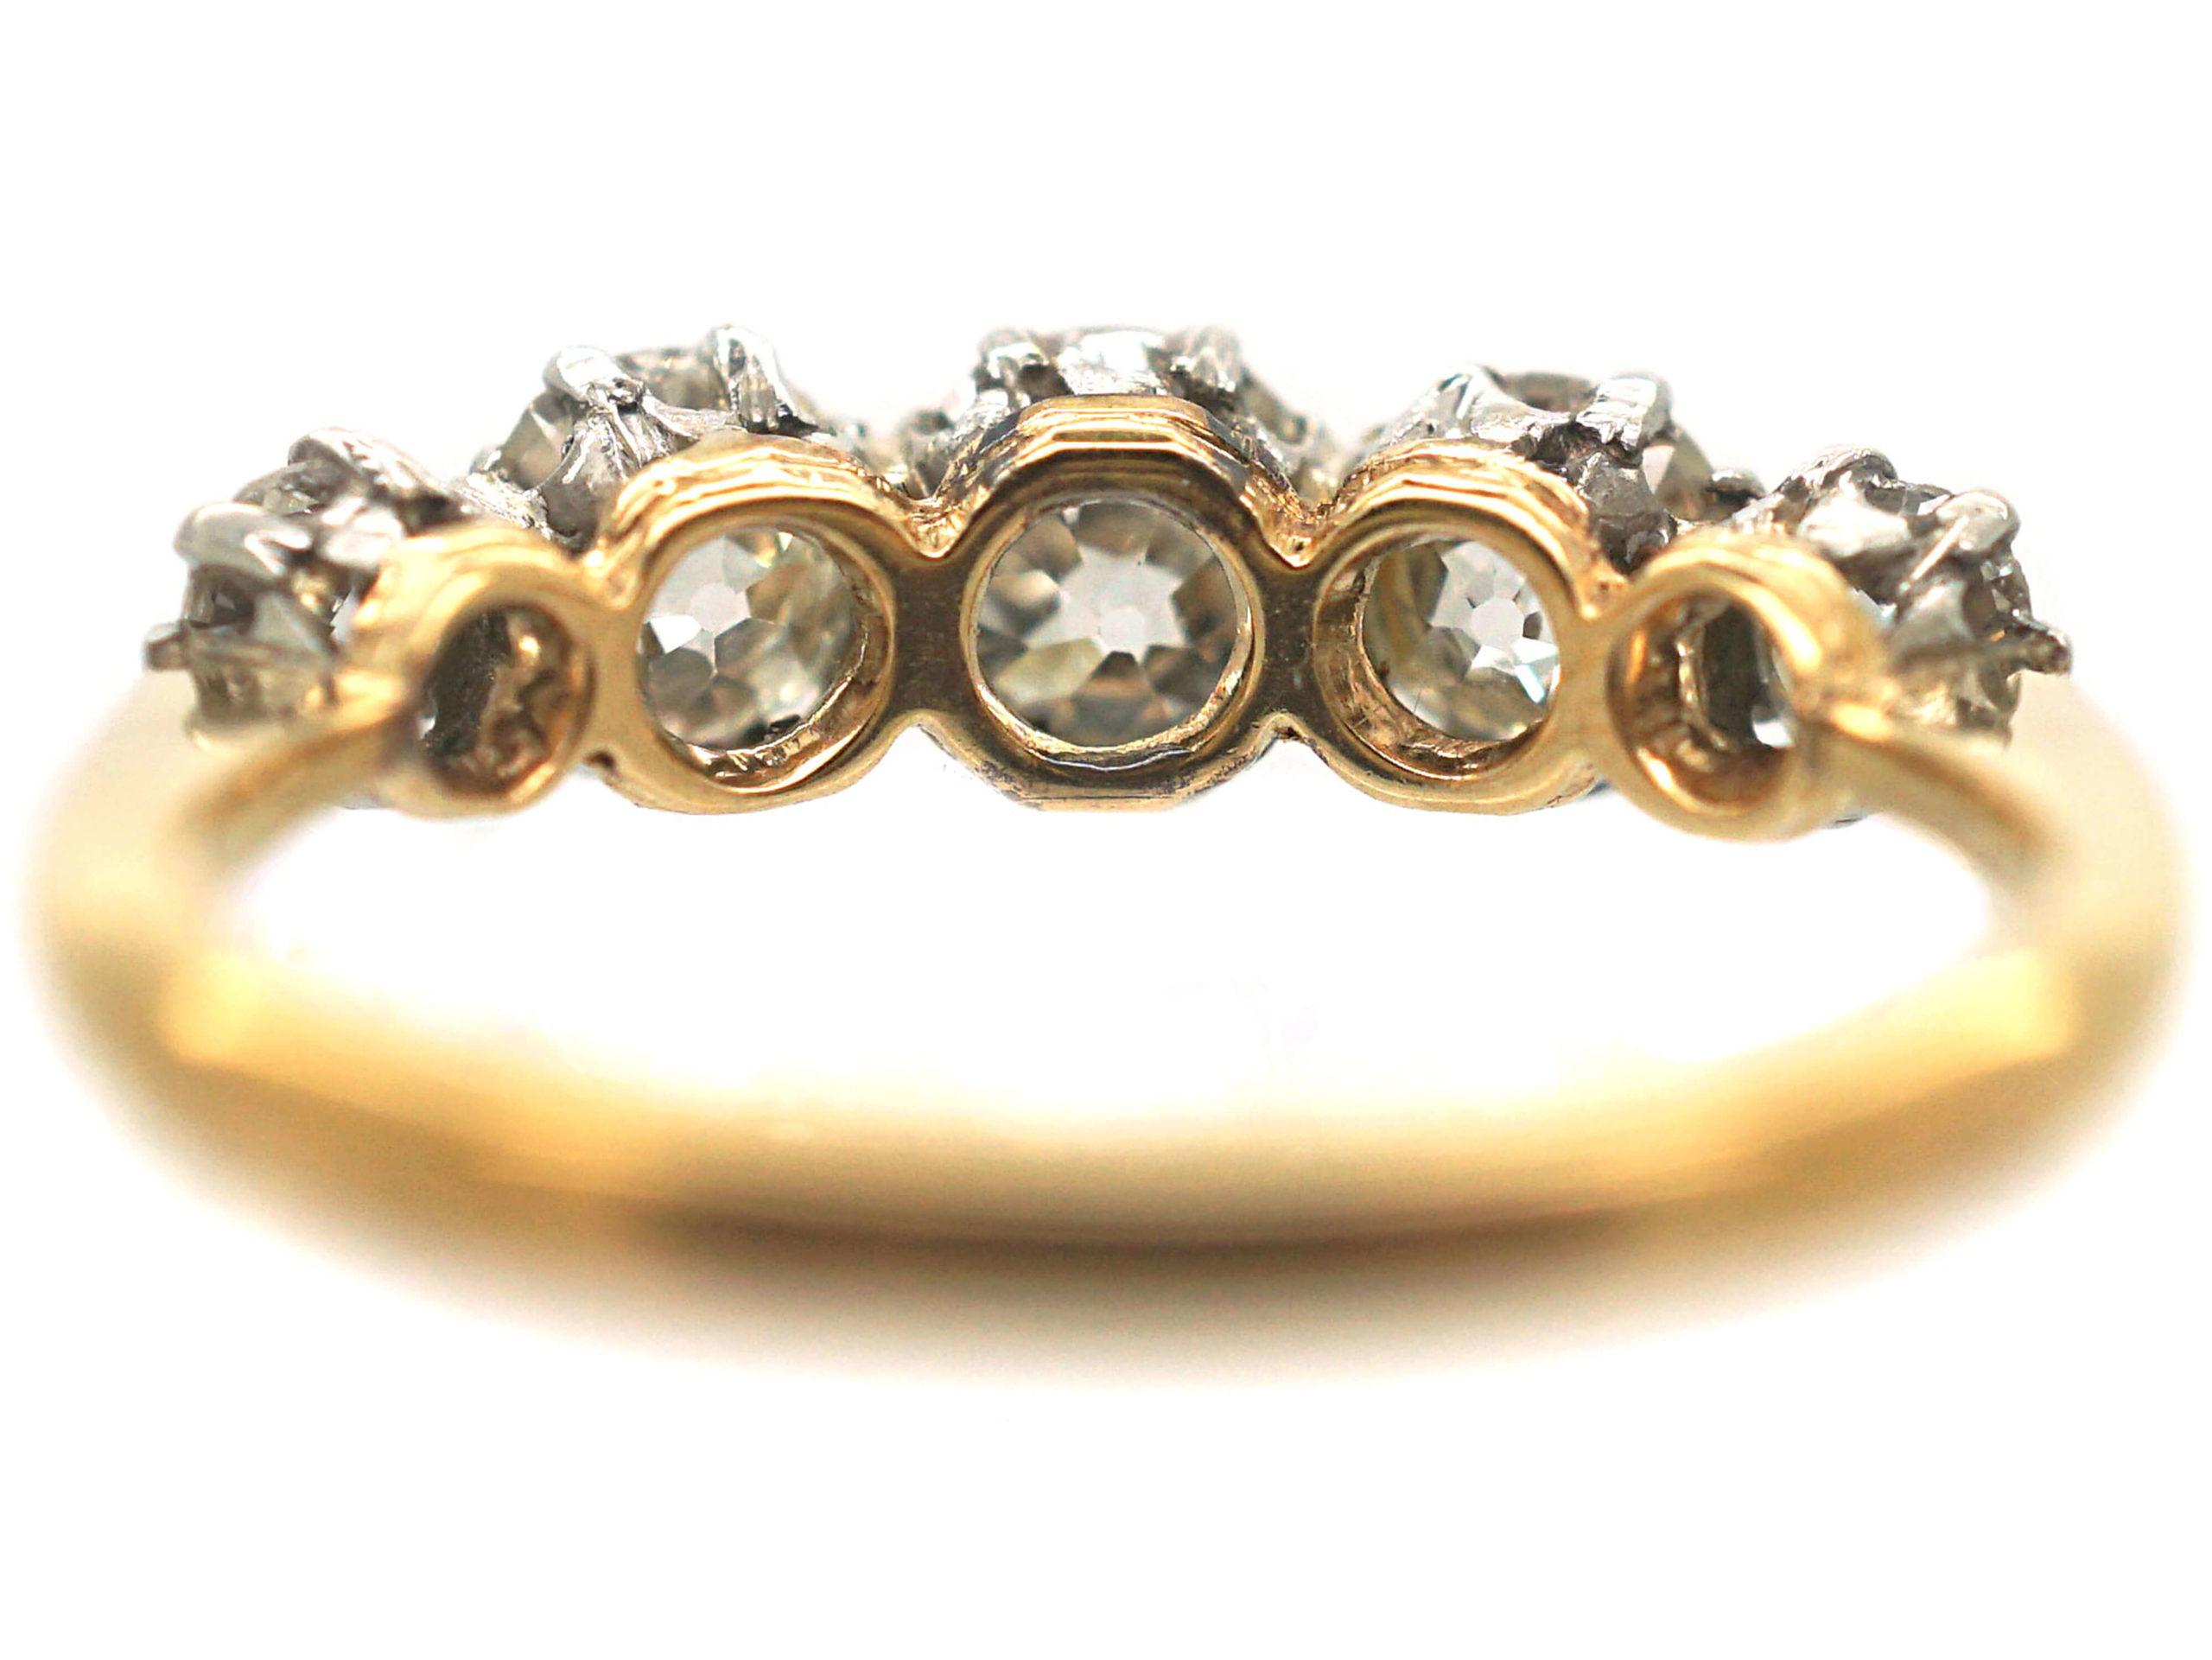 18ct Gold & Platinum Five Stone Diamond Ring